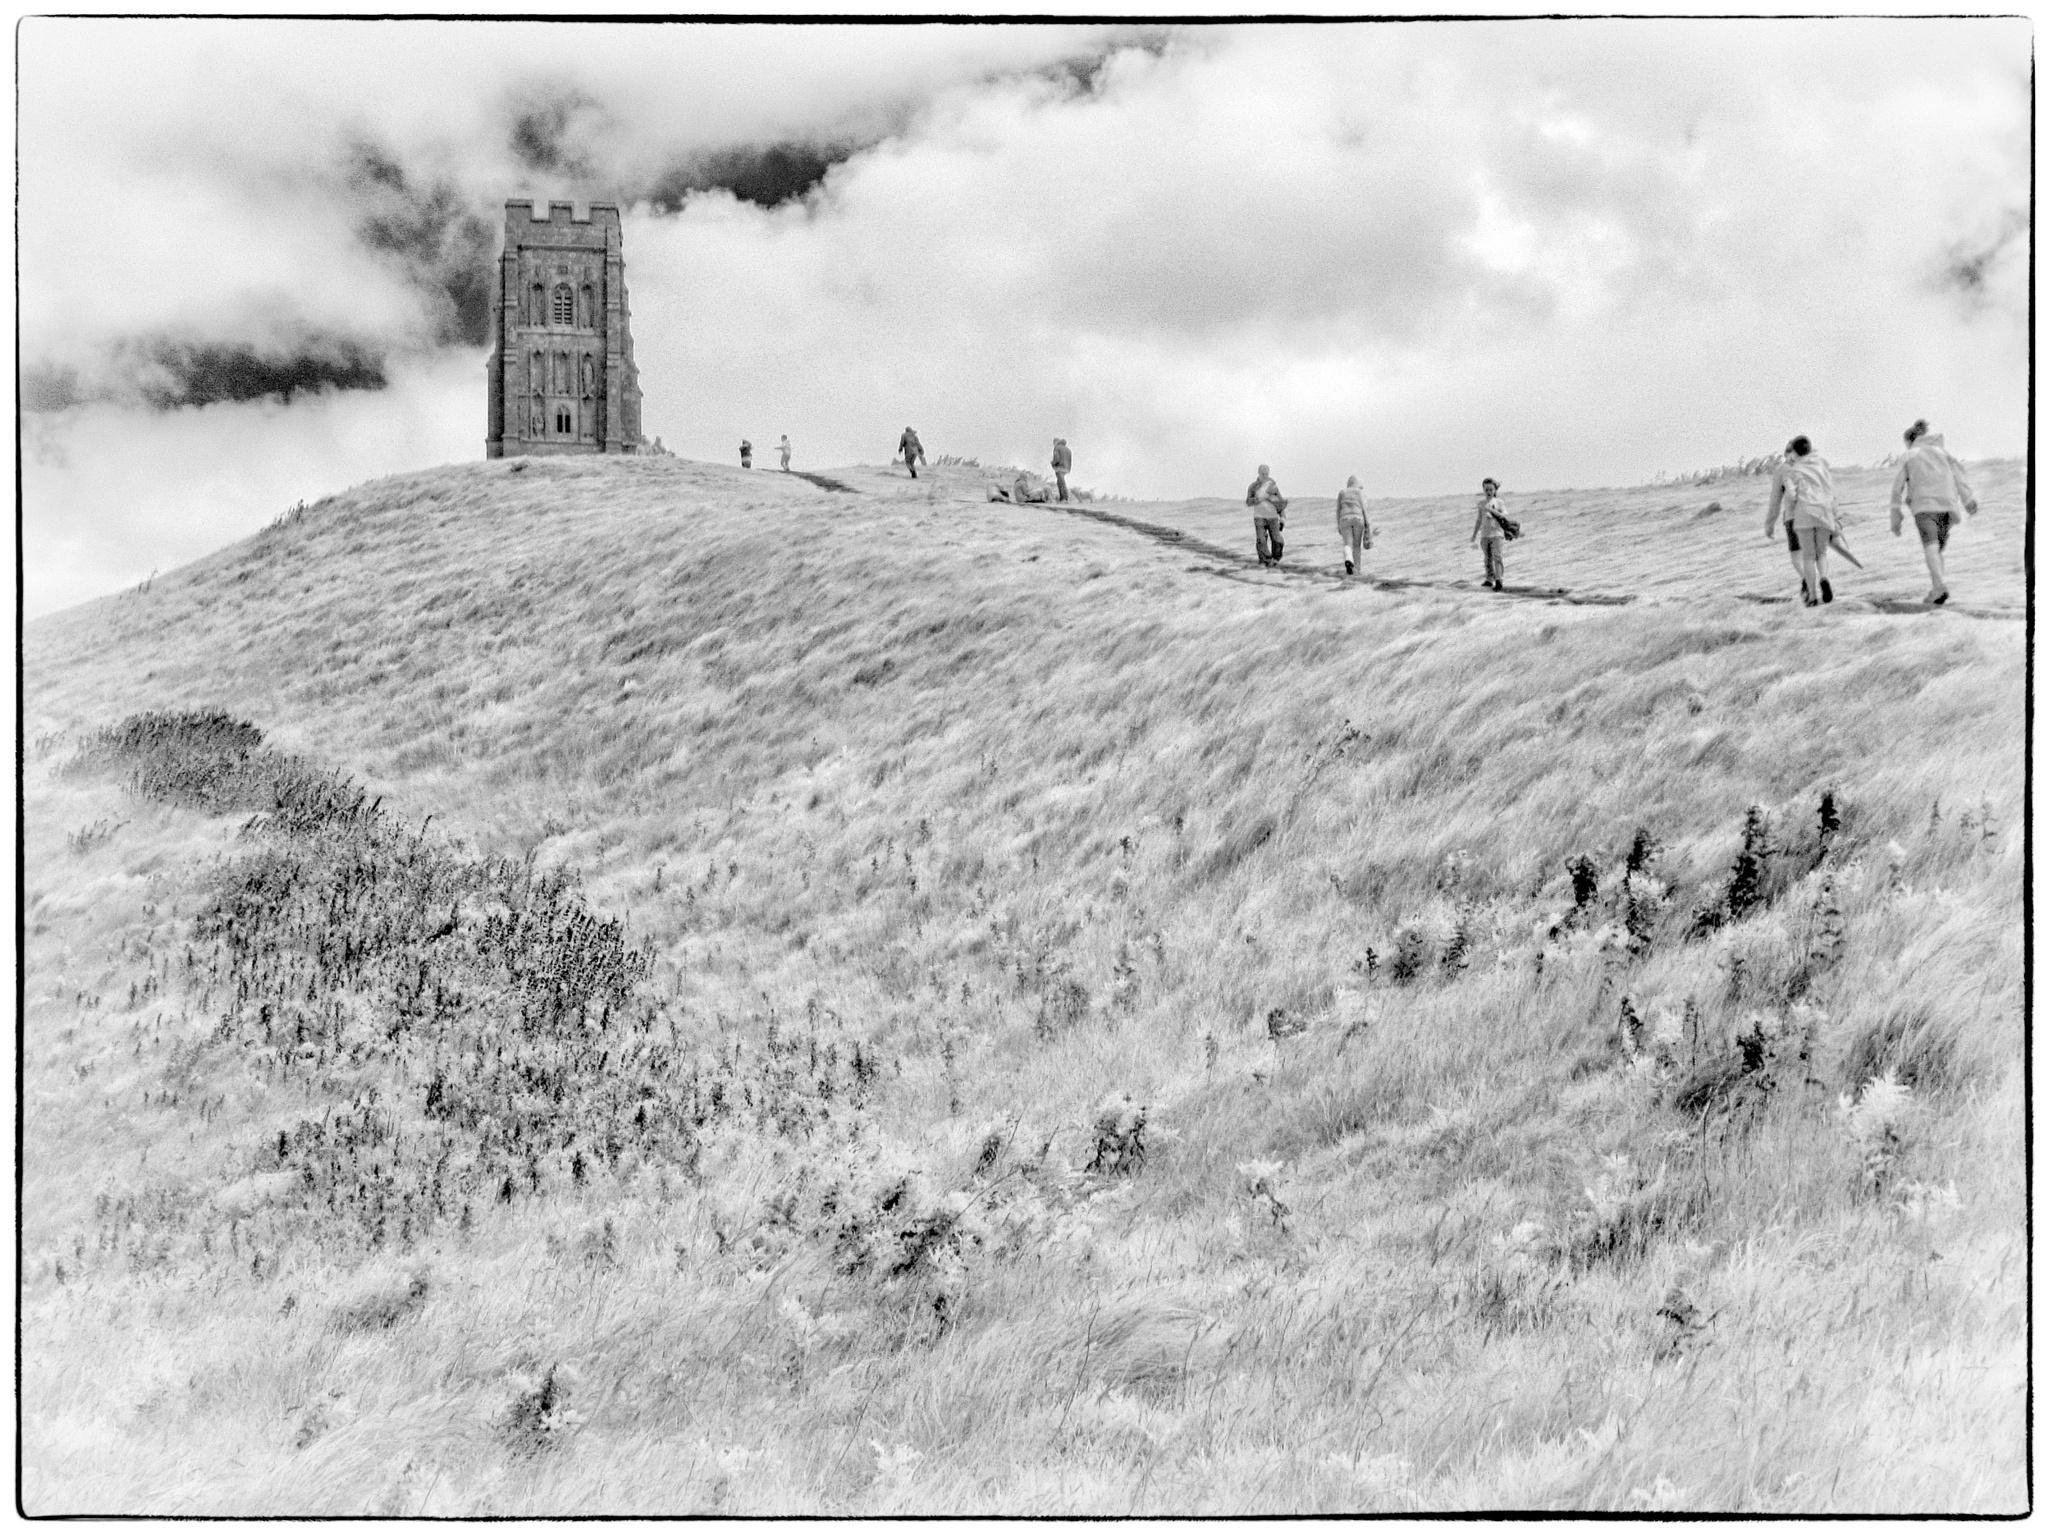 Glastonbury Pilgrimage by Roy Smart